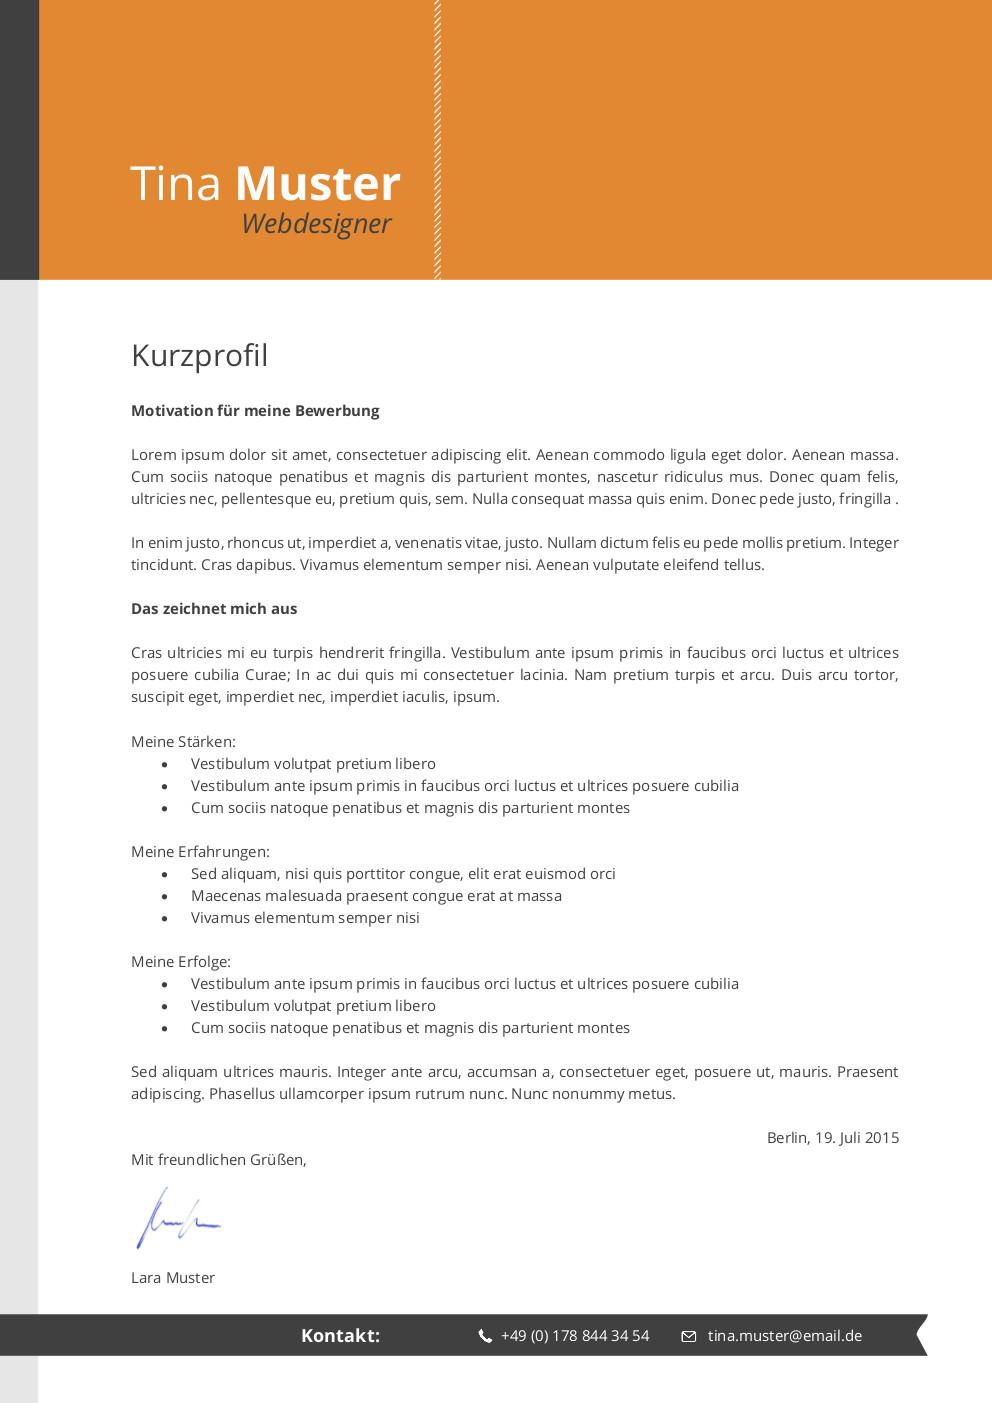 Premium Bewerbungsmuster 4 | lebenslaufdesigns.de